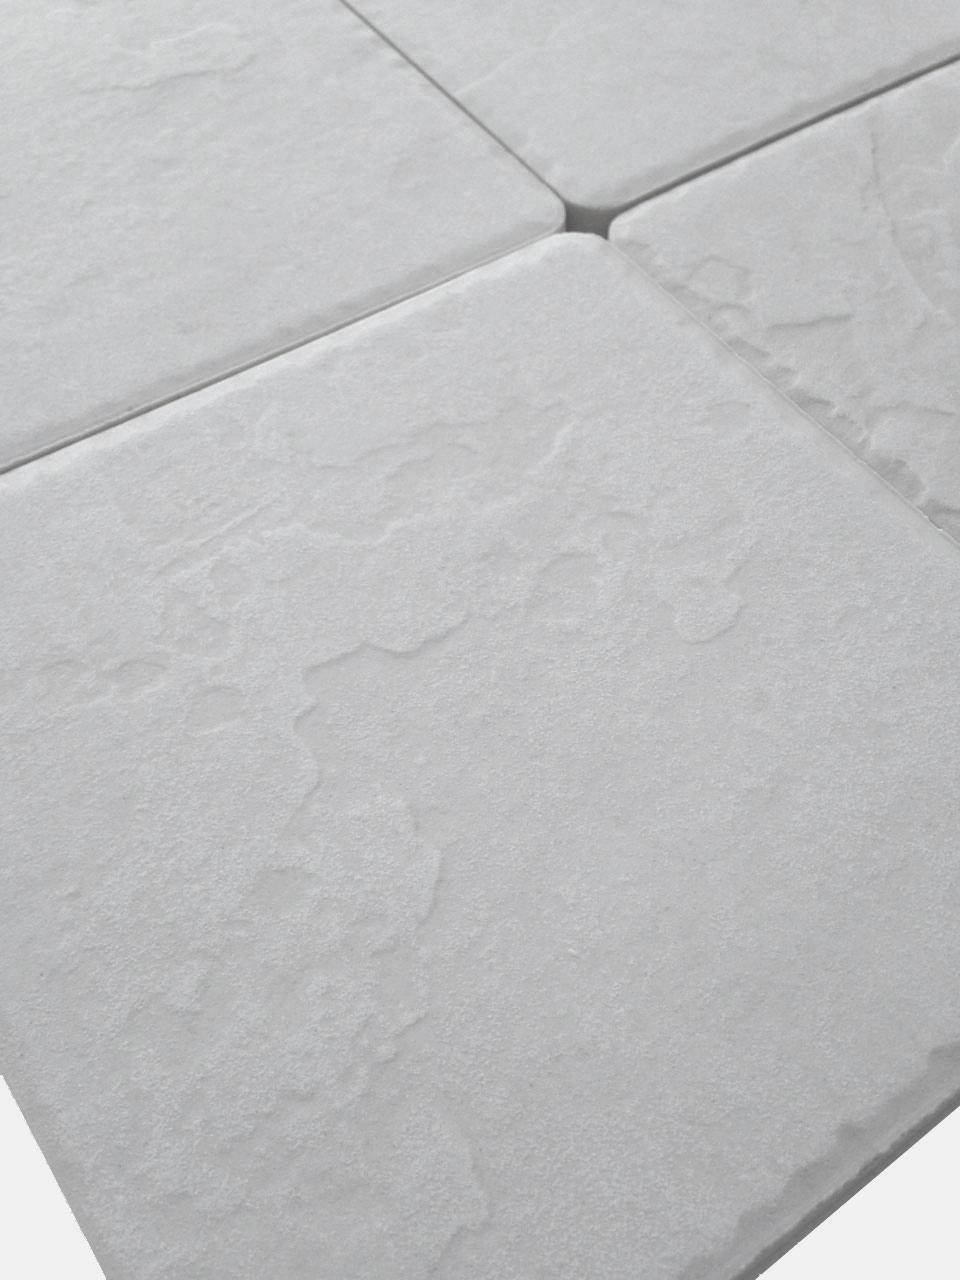 Piastrelle pavimento esterno gres porcellanato antiscivolo 15x15 bianco himalaya ebay - Piastrelle 15x15 bianco lucido ...